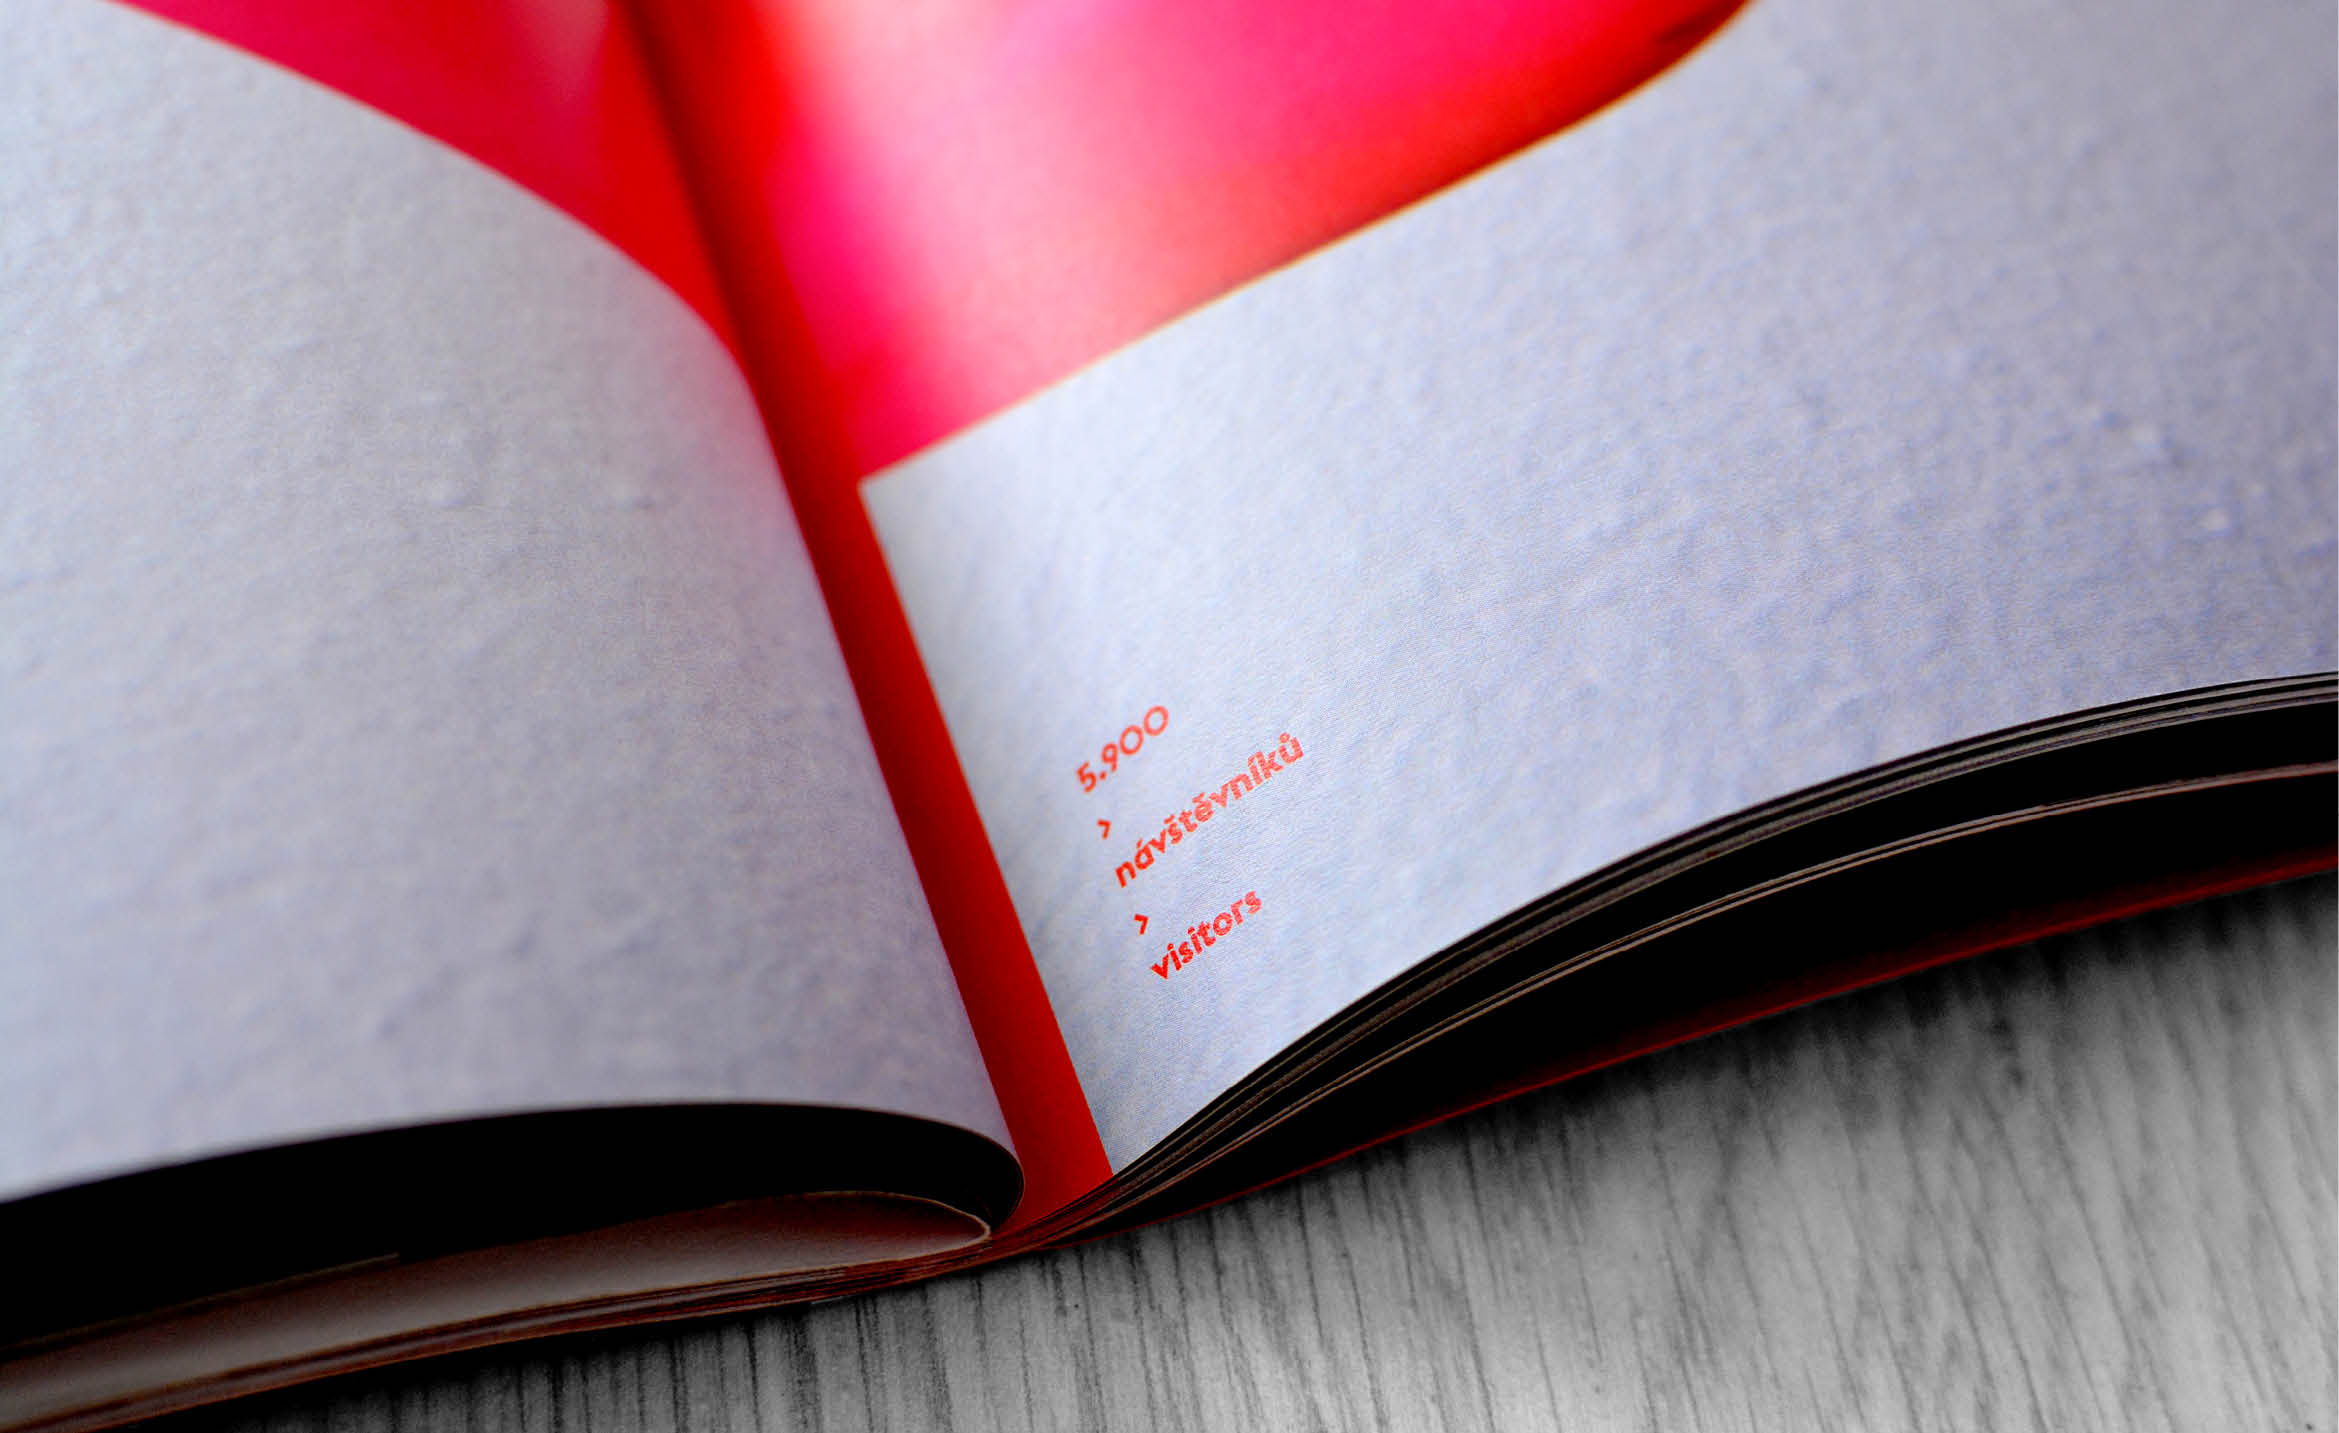 kristyna_greplova_diploma_project_4